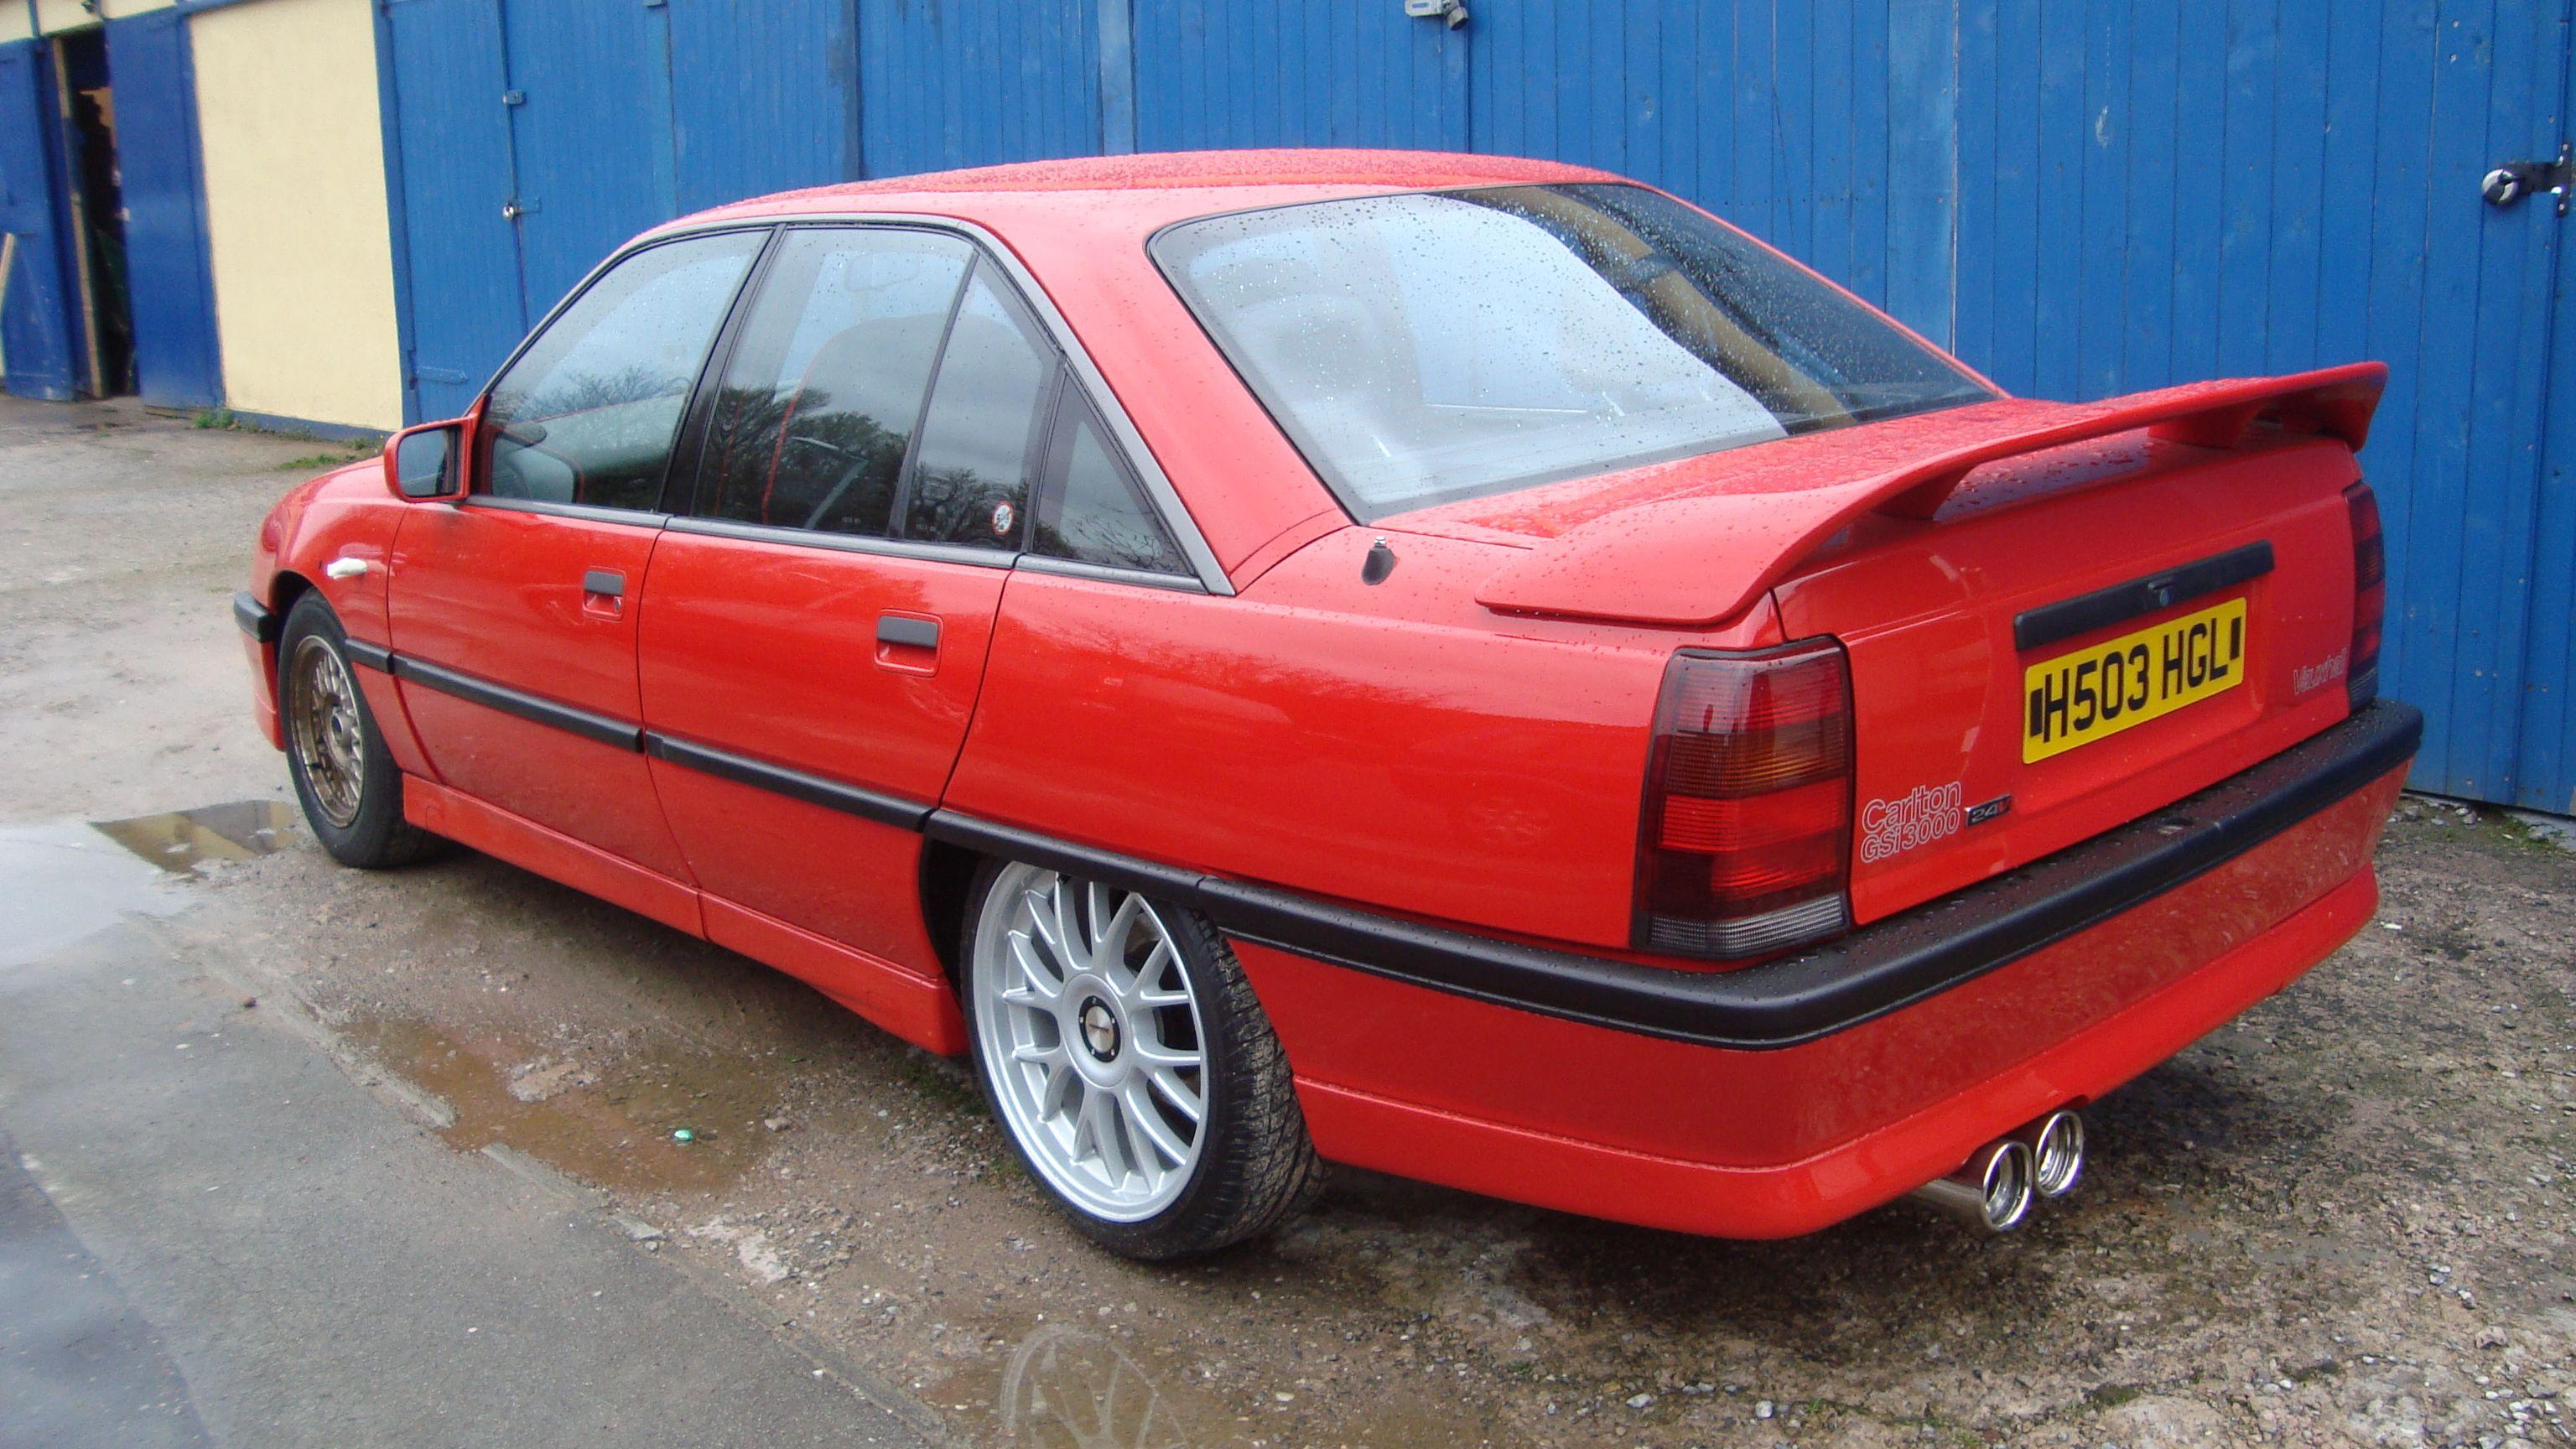 Vauxhall Carlton File 1991 Vauxhall Carlton 3 0 Gsi 24v